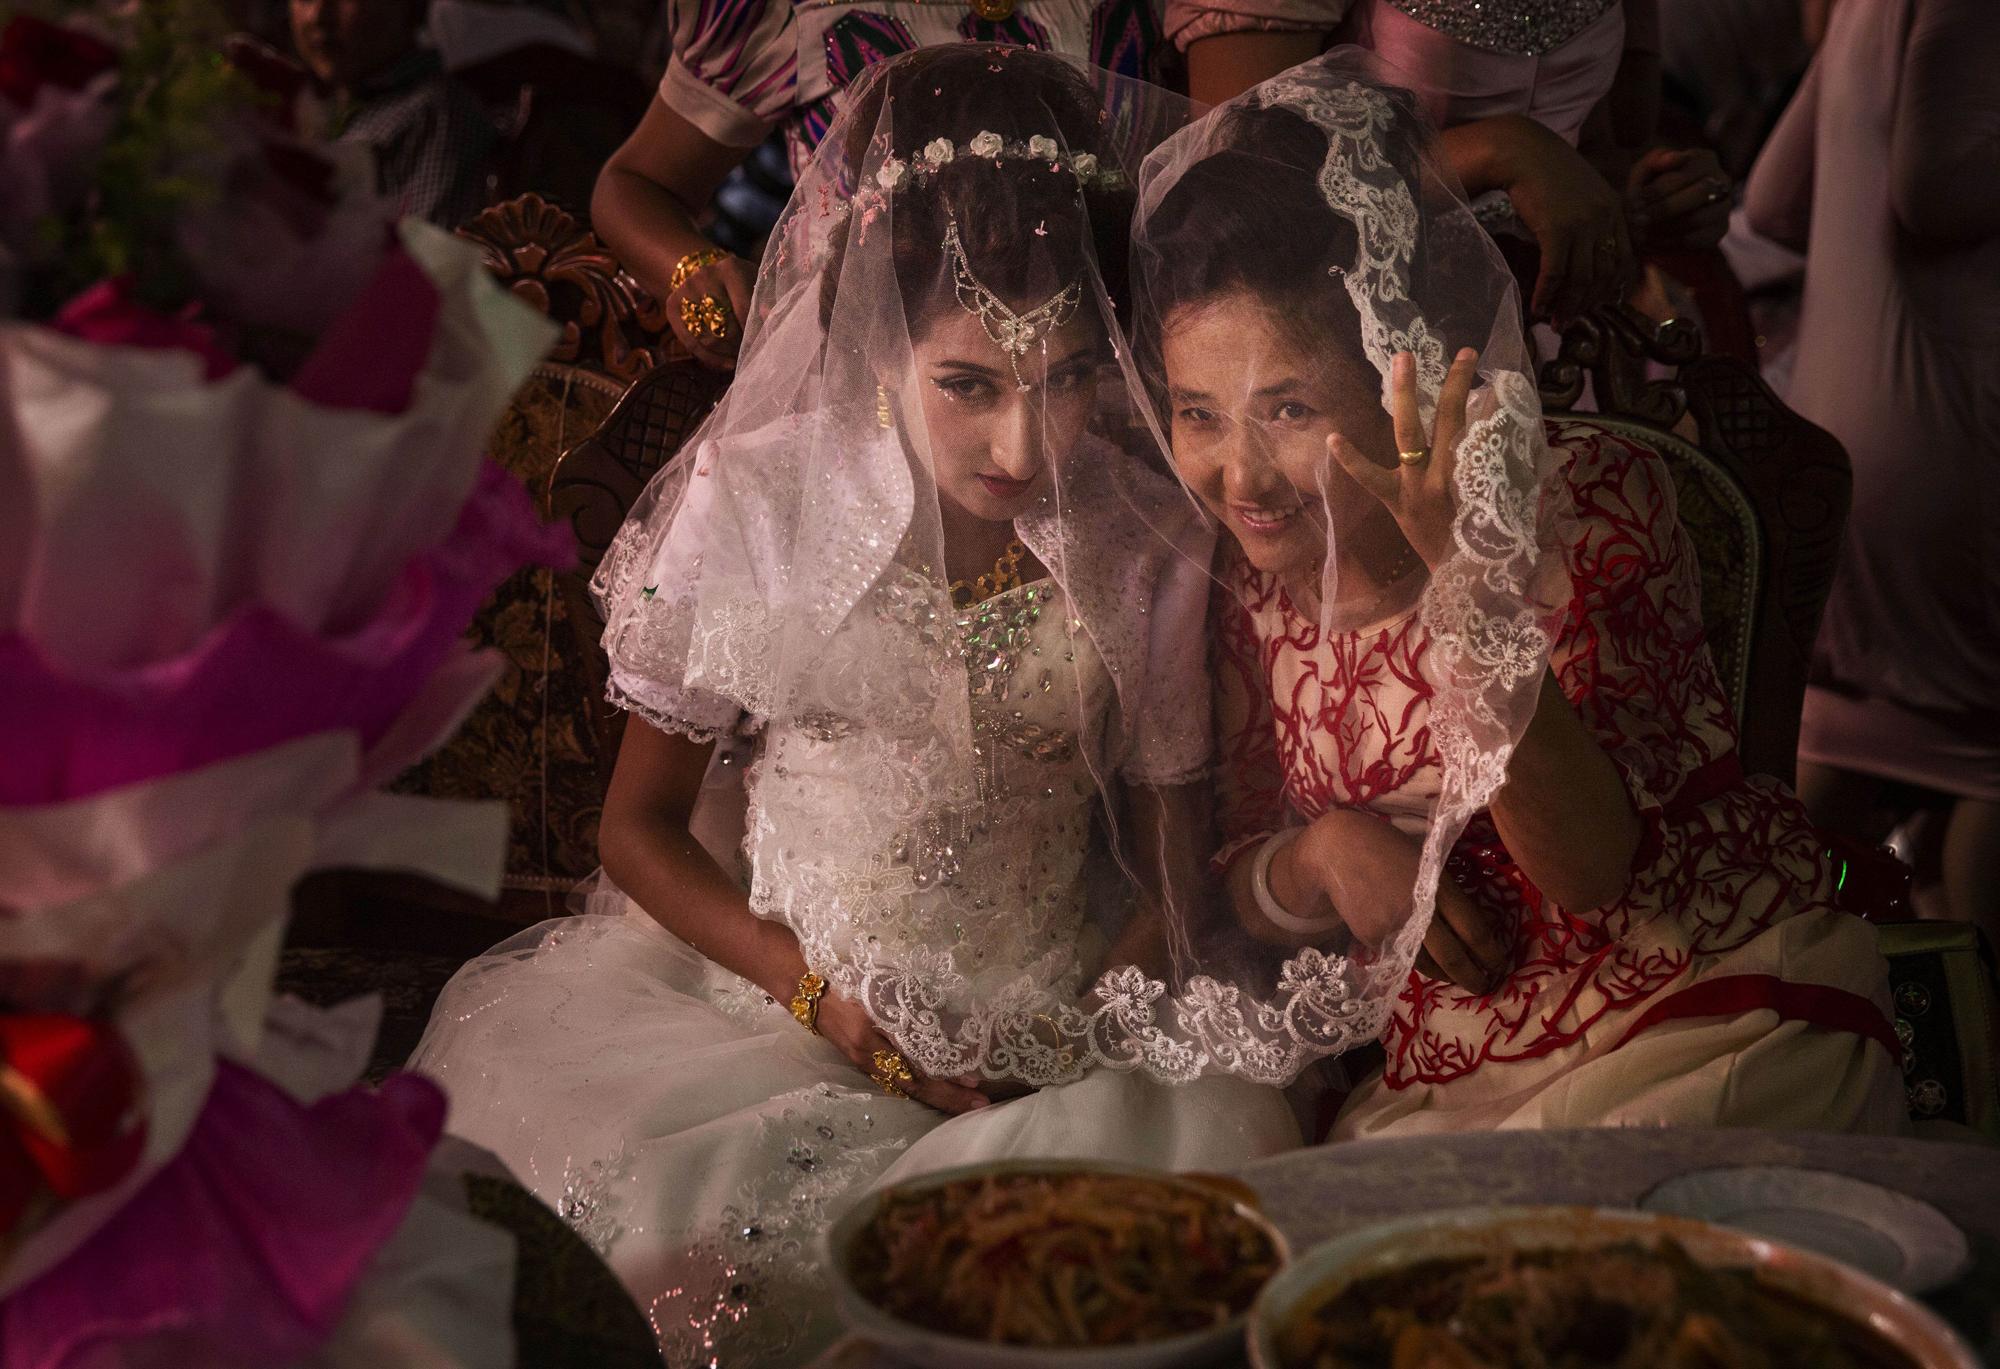 A Uighur bride talks with a friend at her  wedding celebration on August 2, 2014 in Kashgar.